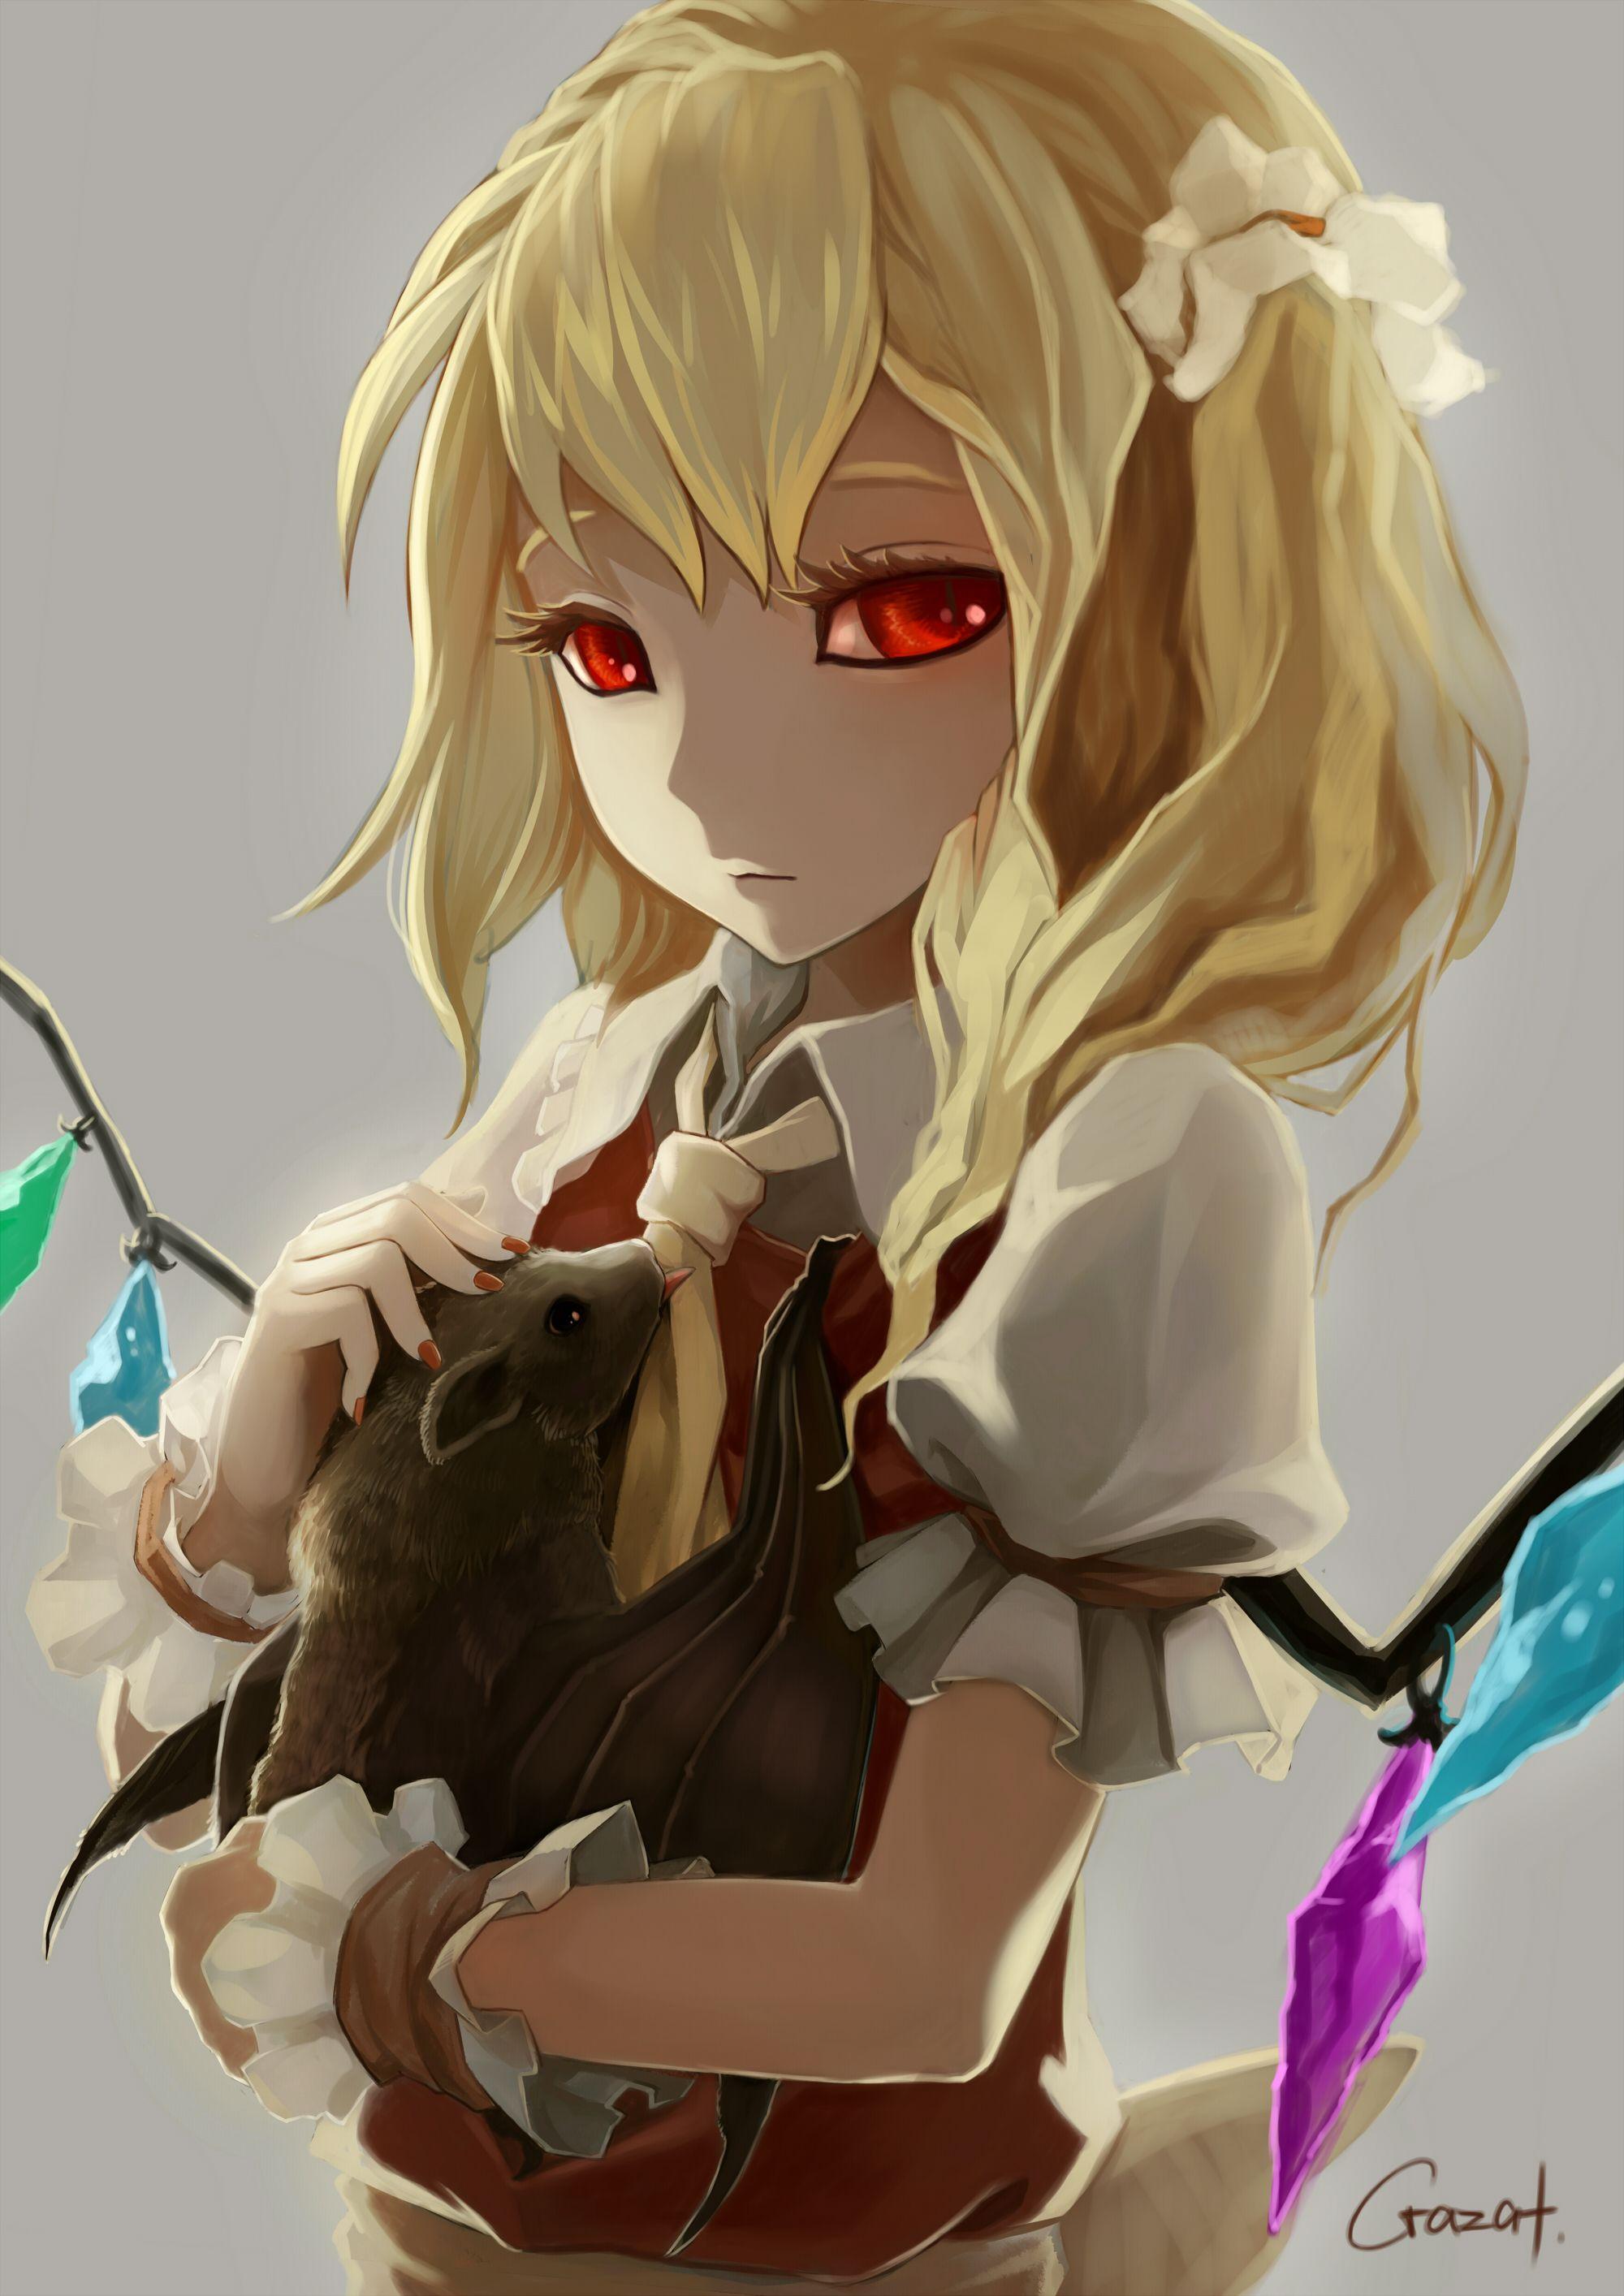 Anime girl eyes think, that